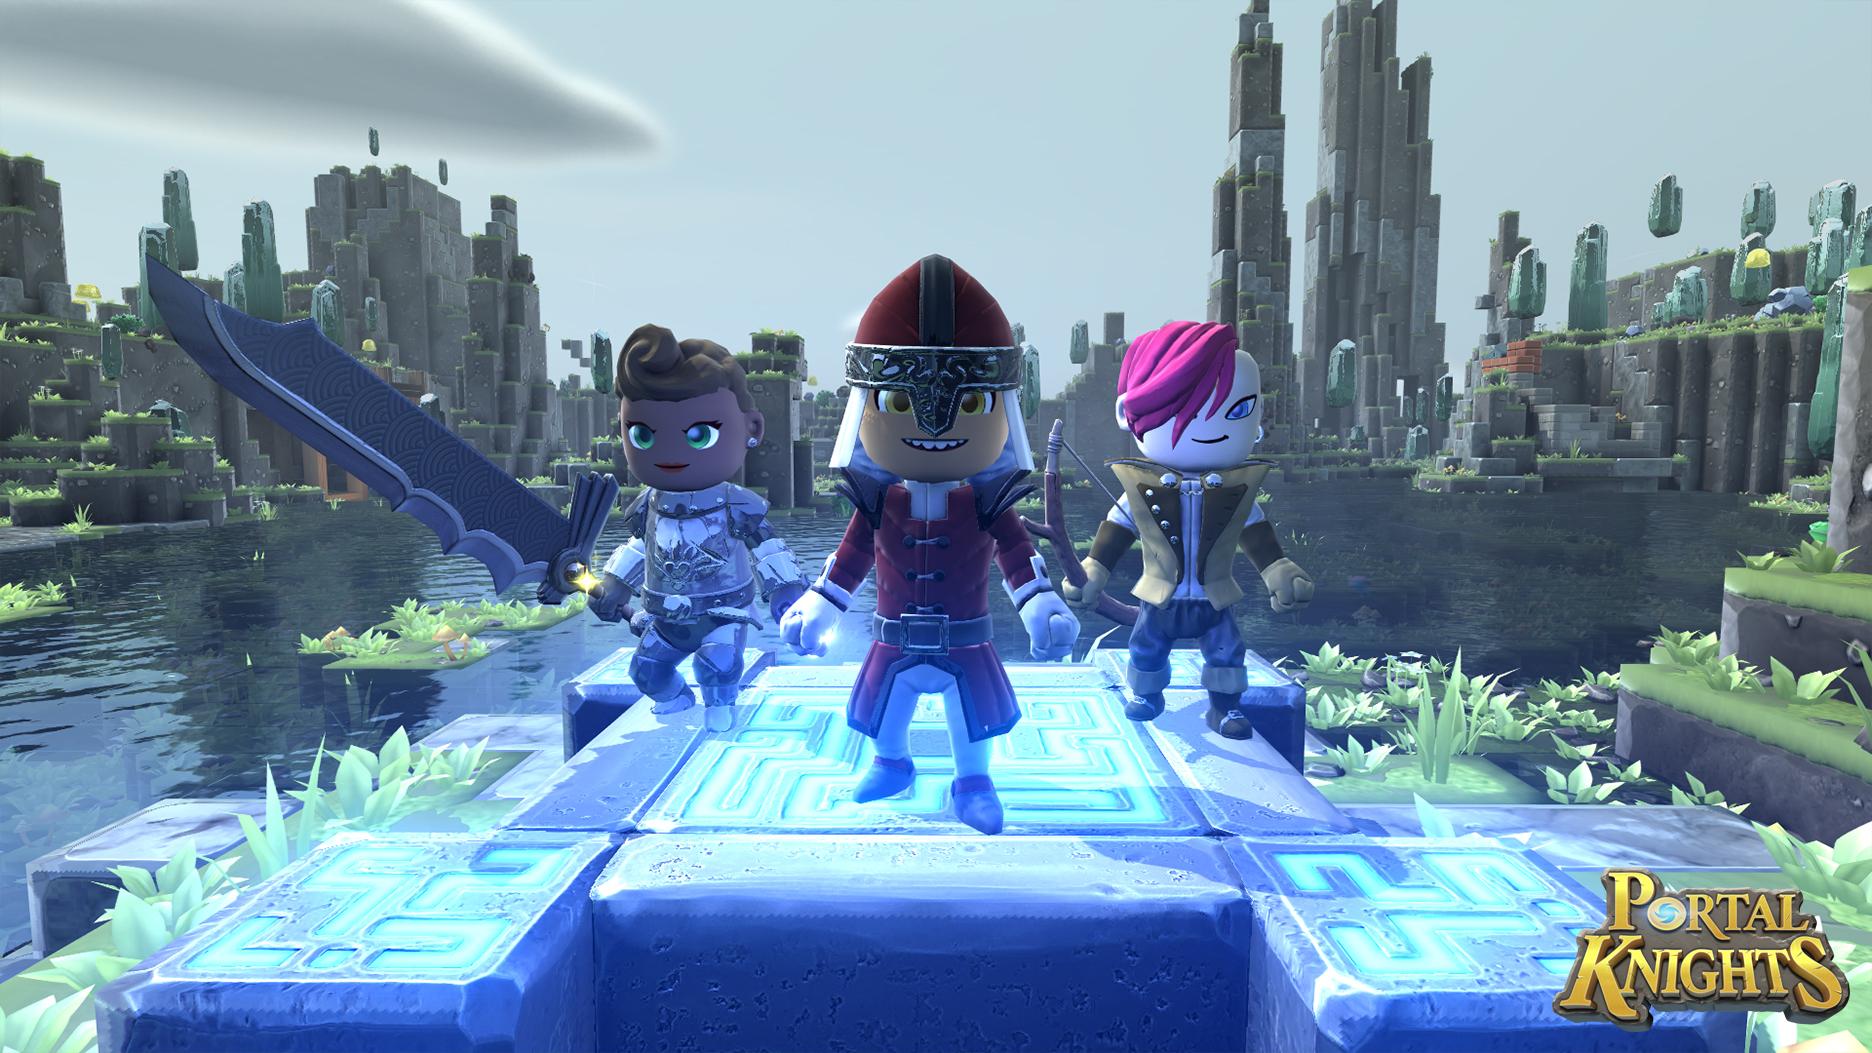 3 D Sandbox Rpg Portal Knights Is Making Its Way To